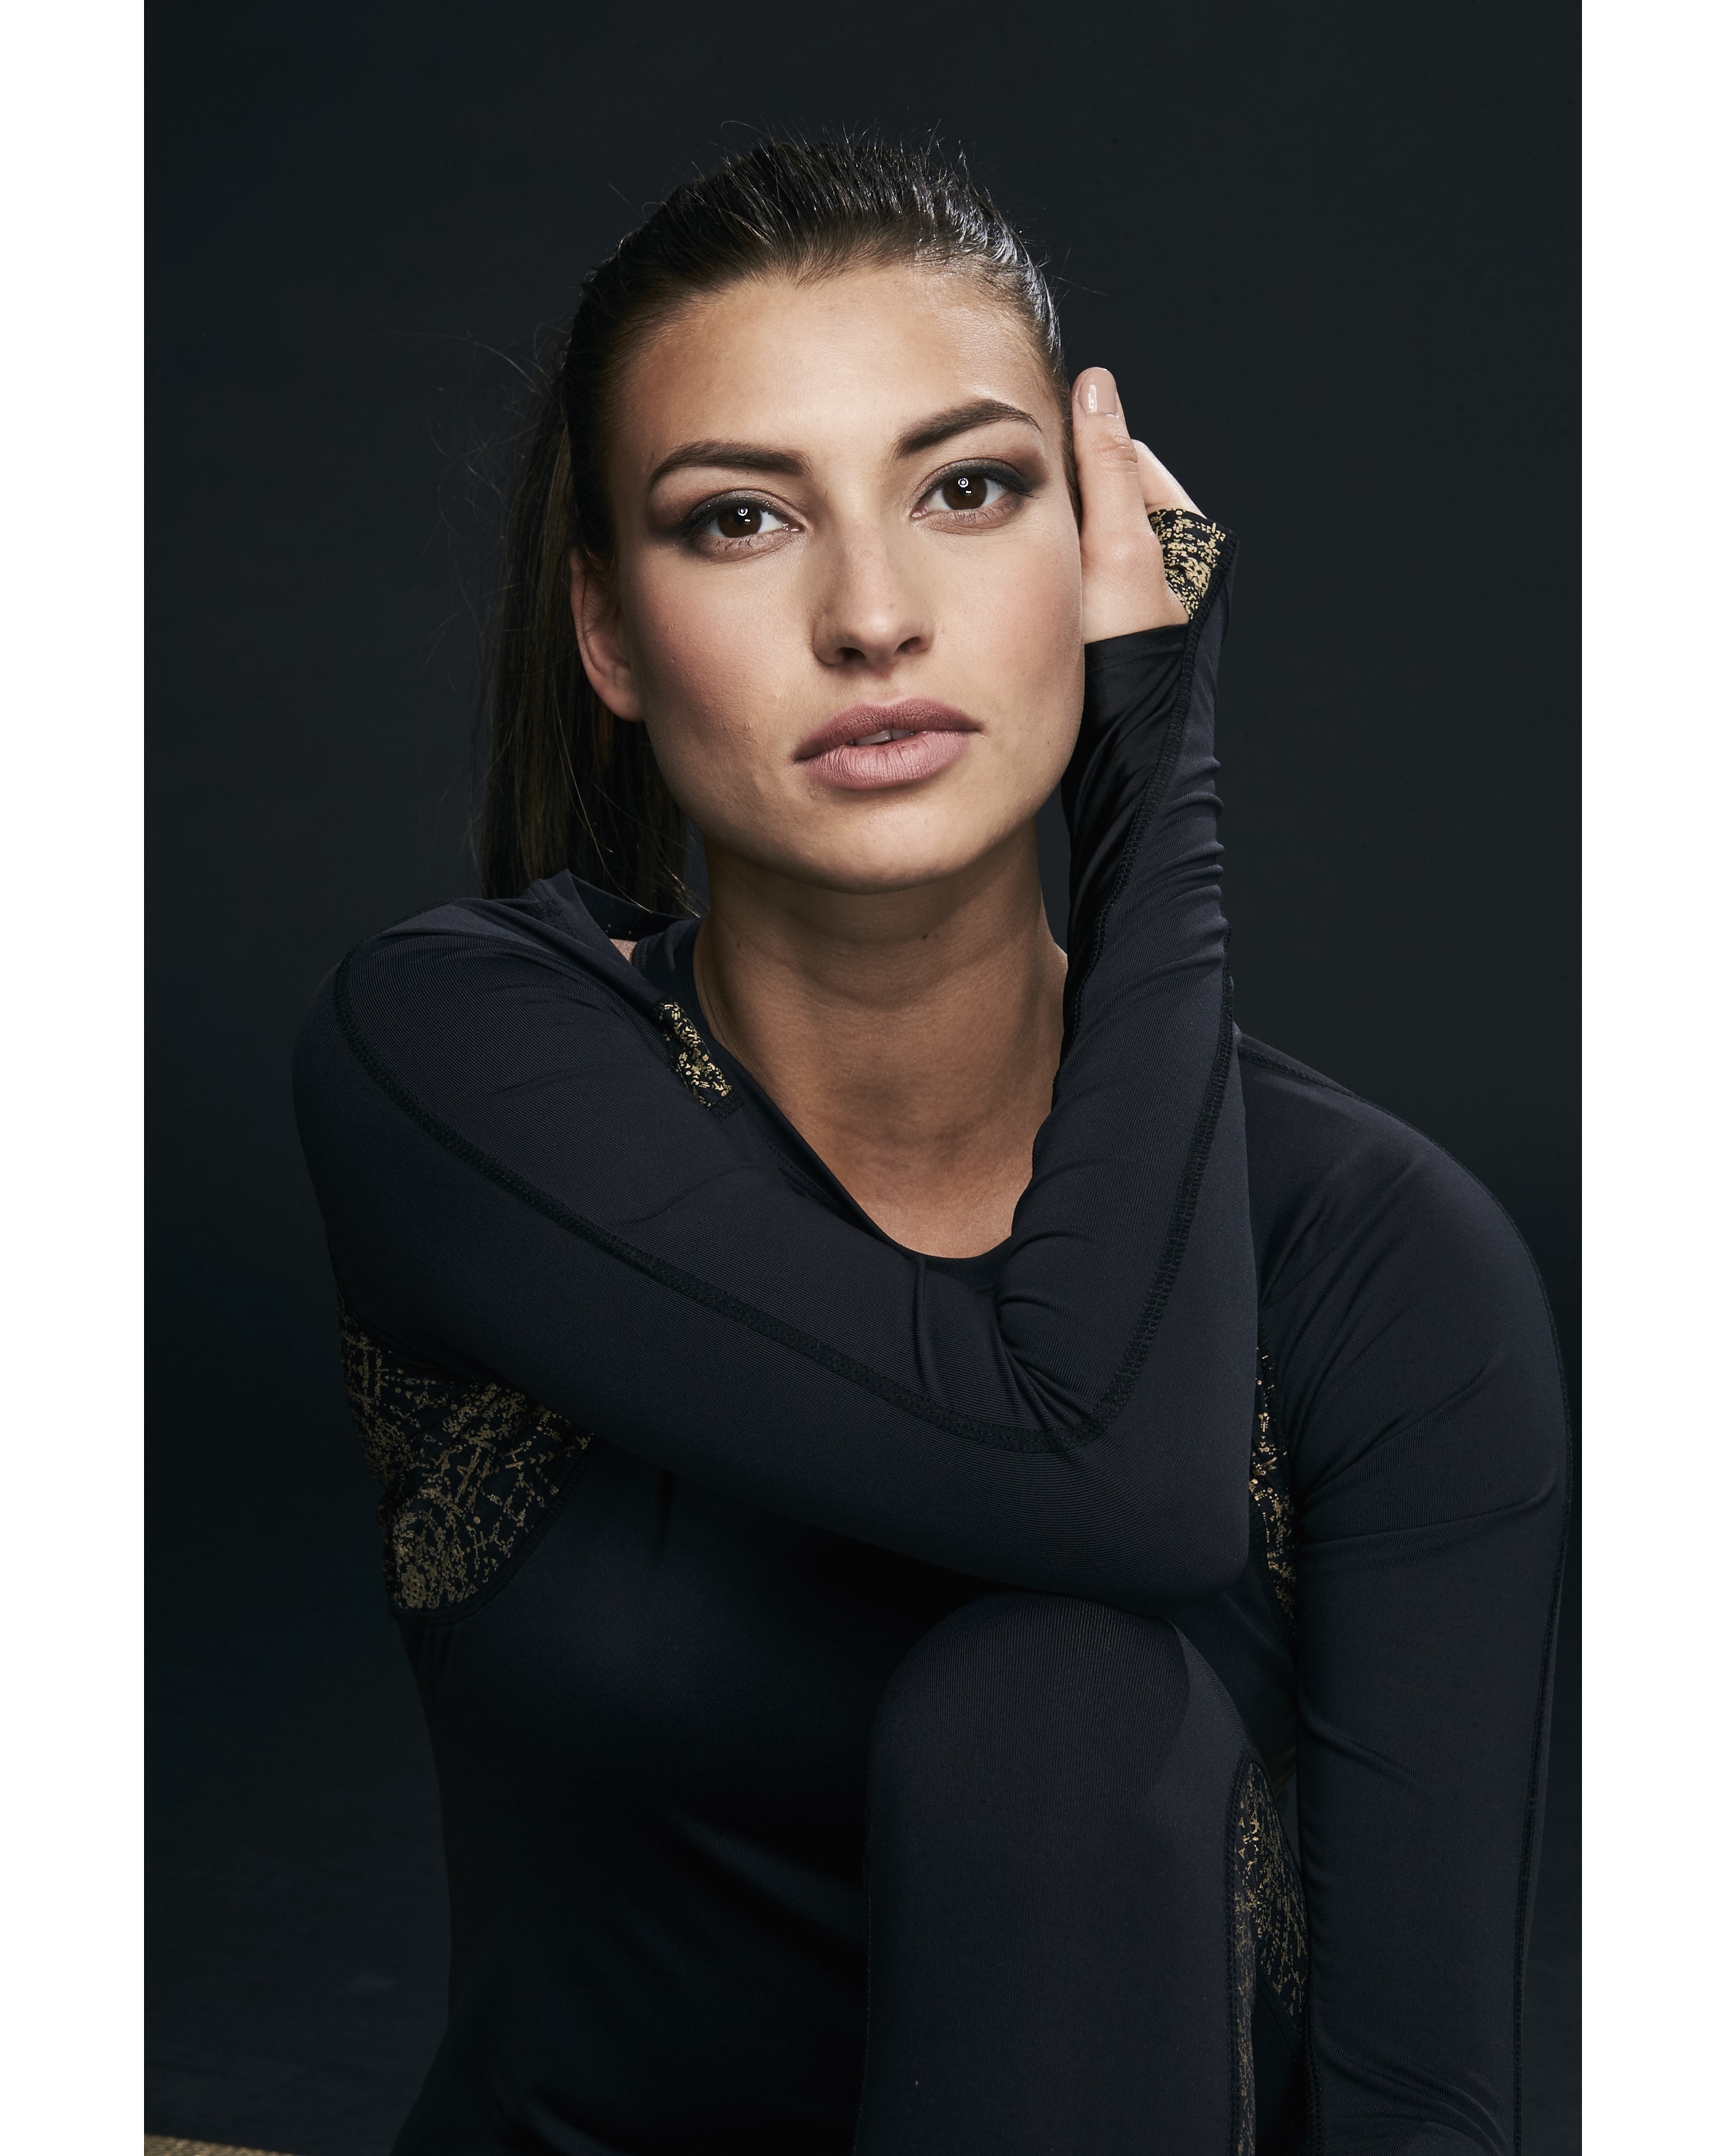 Ellesport Sleek Long Sleeved Performance Top – Black/Gold